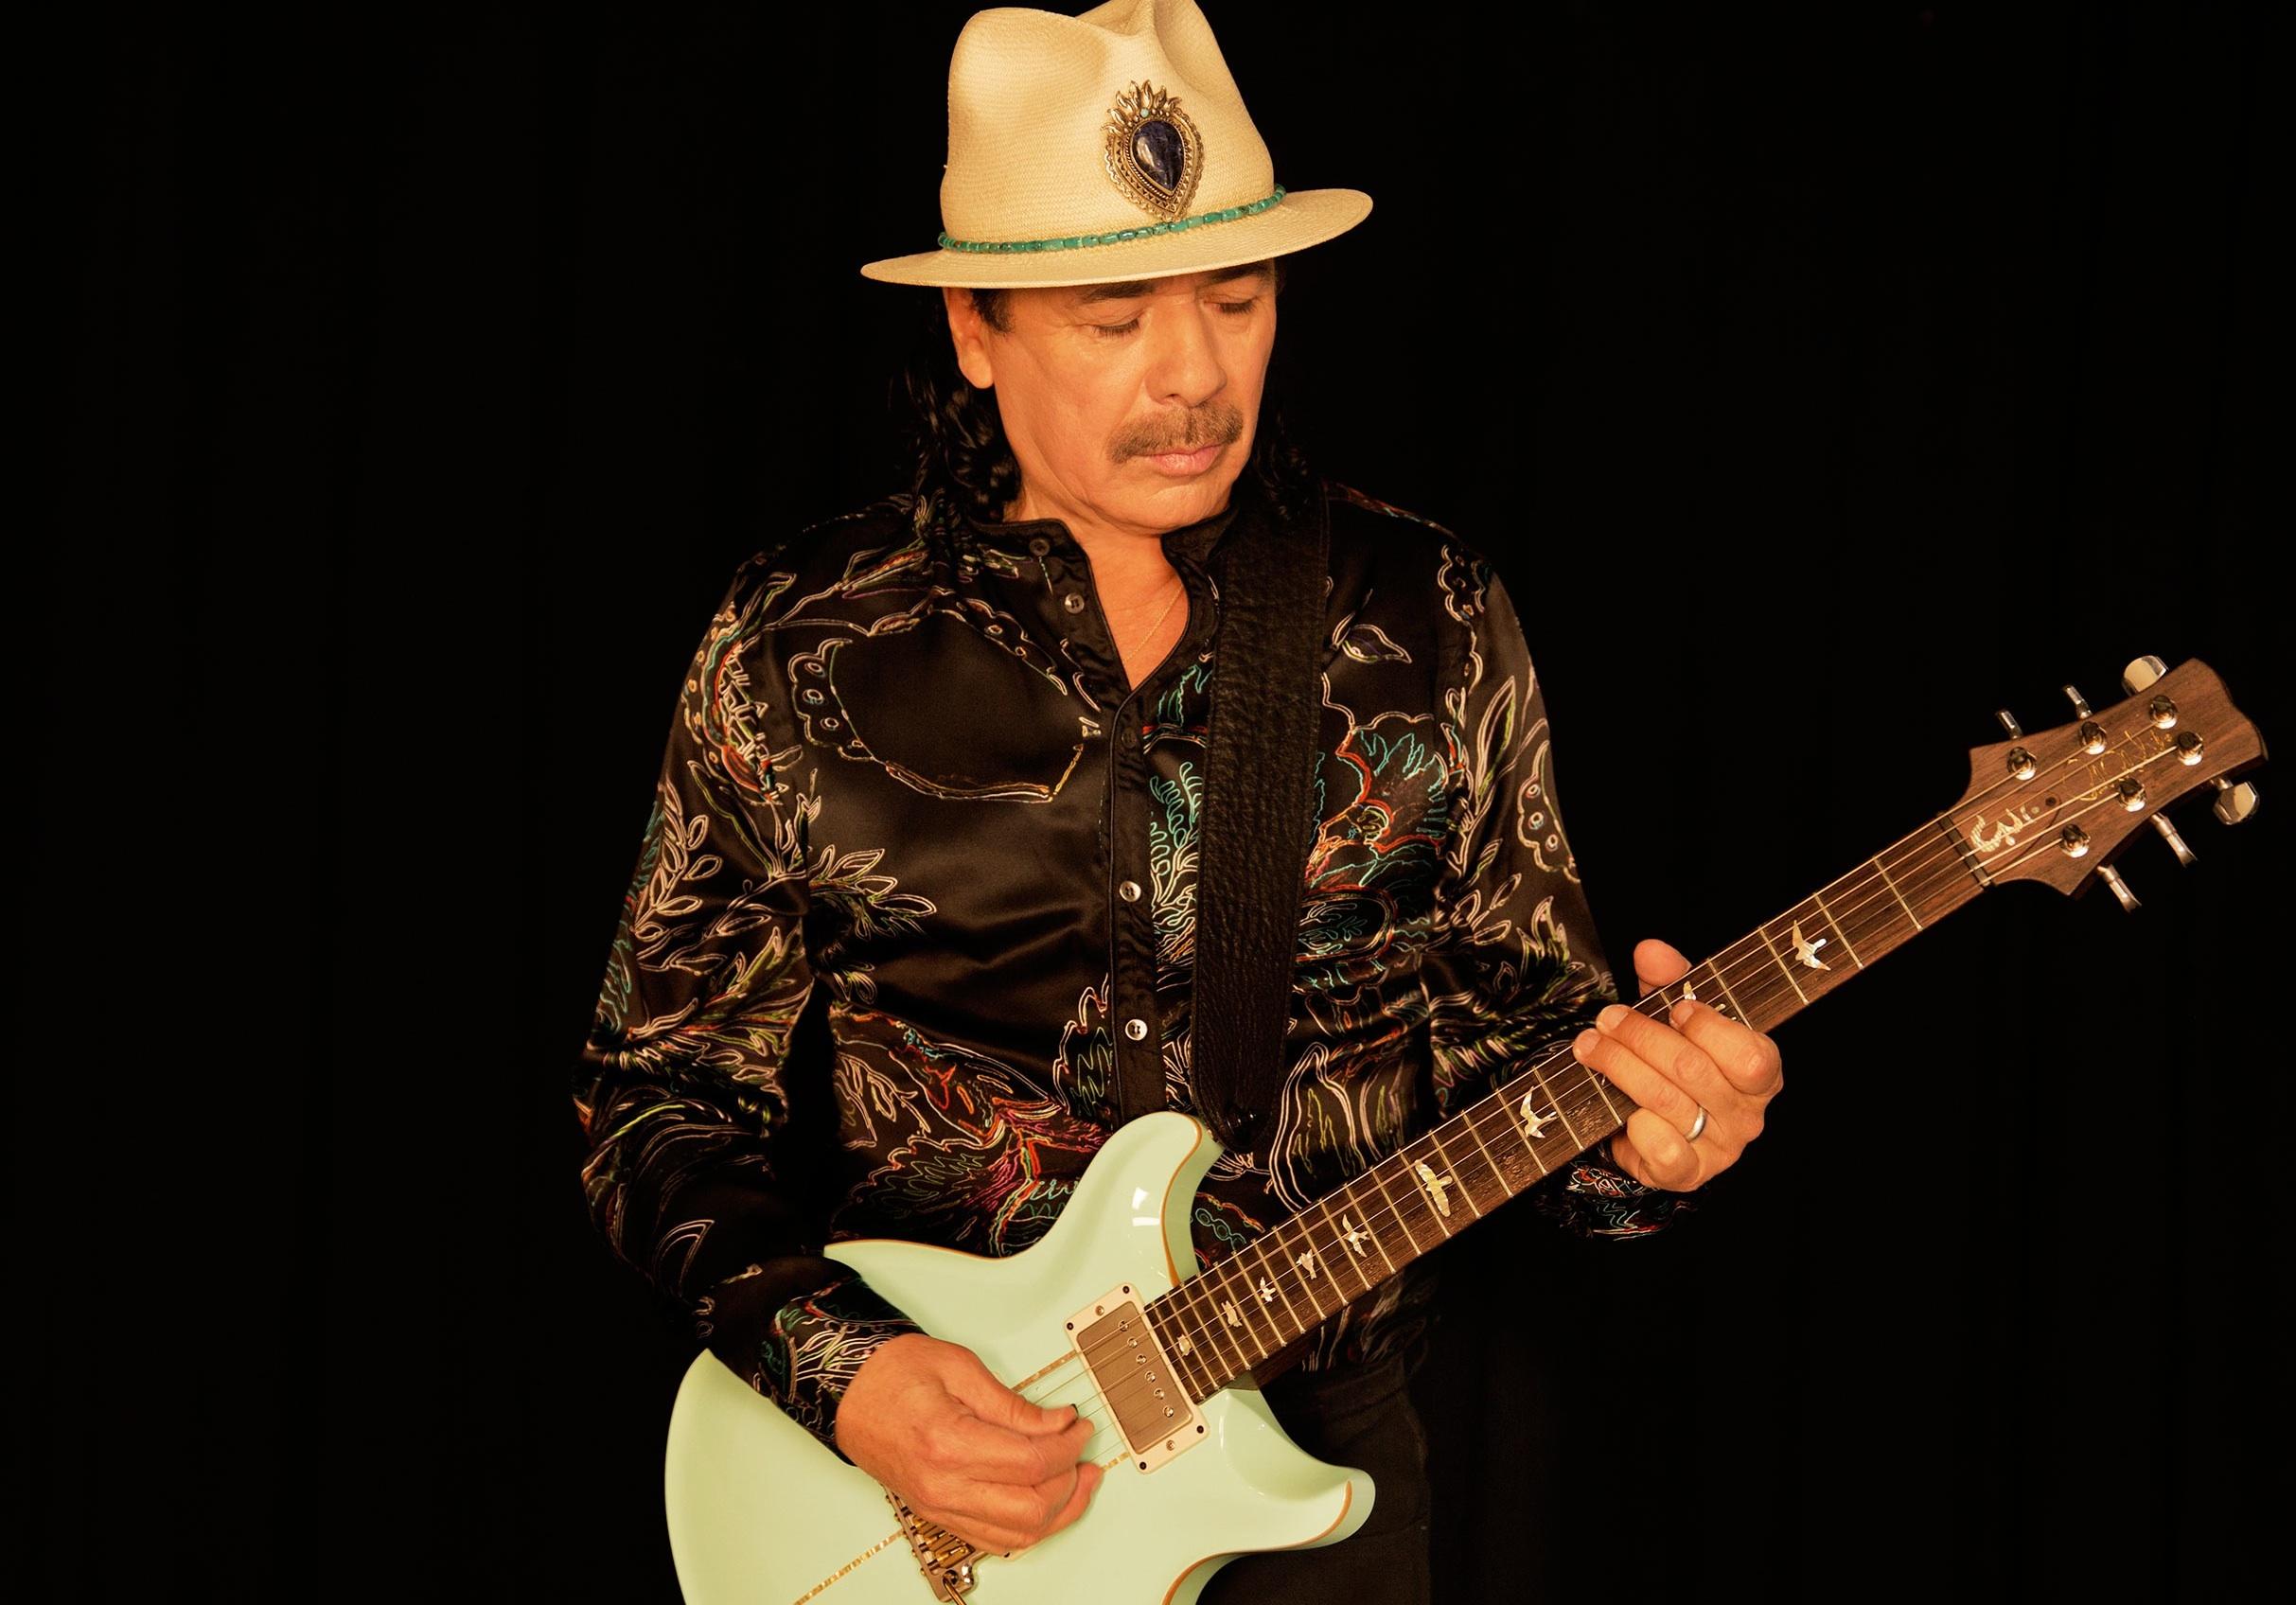 Miami Nights Live Featuring Carlos Santana